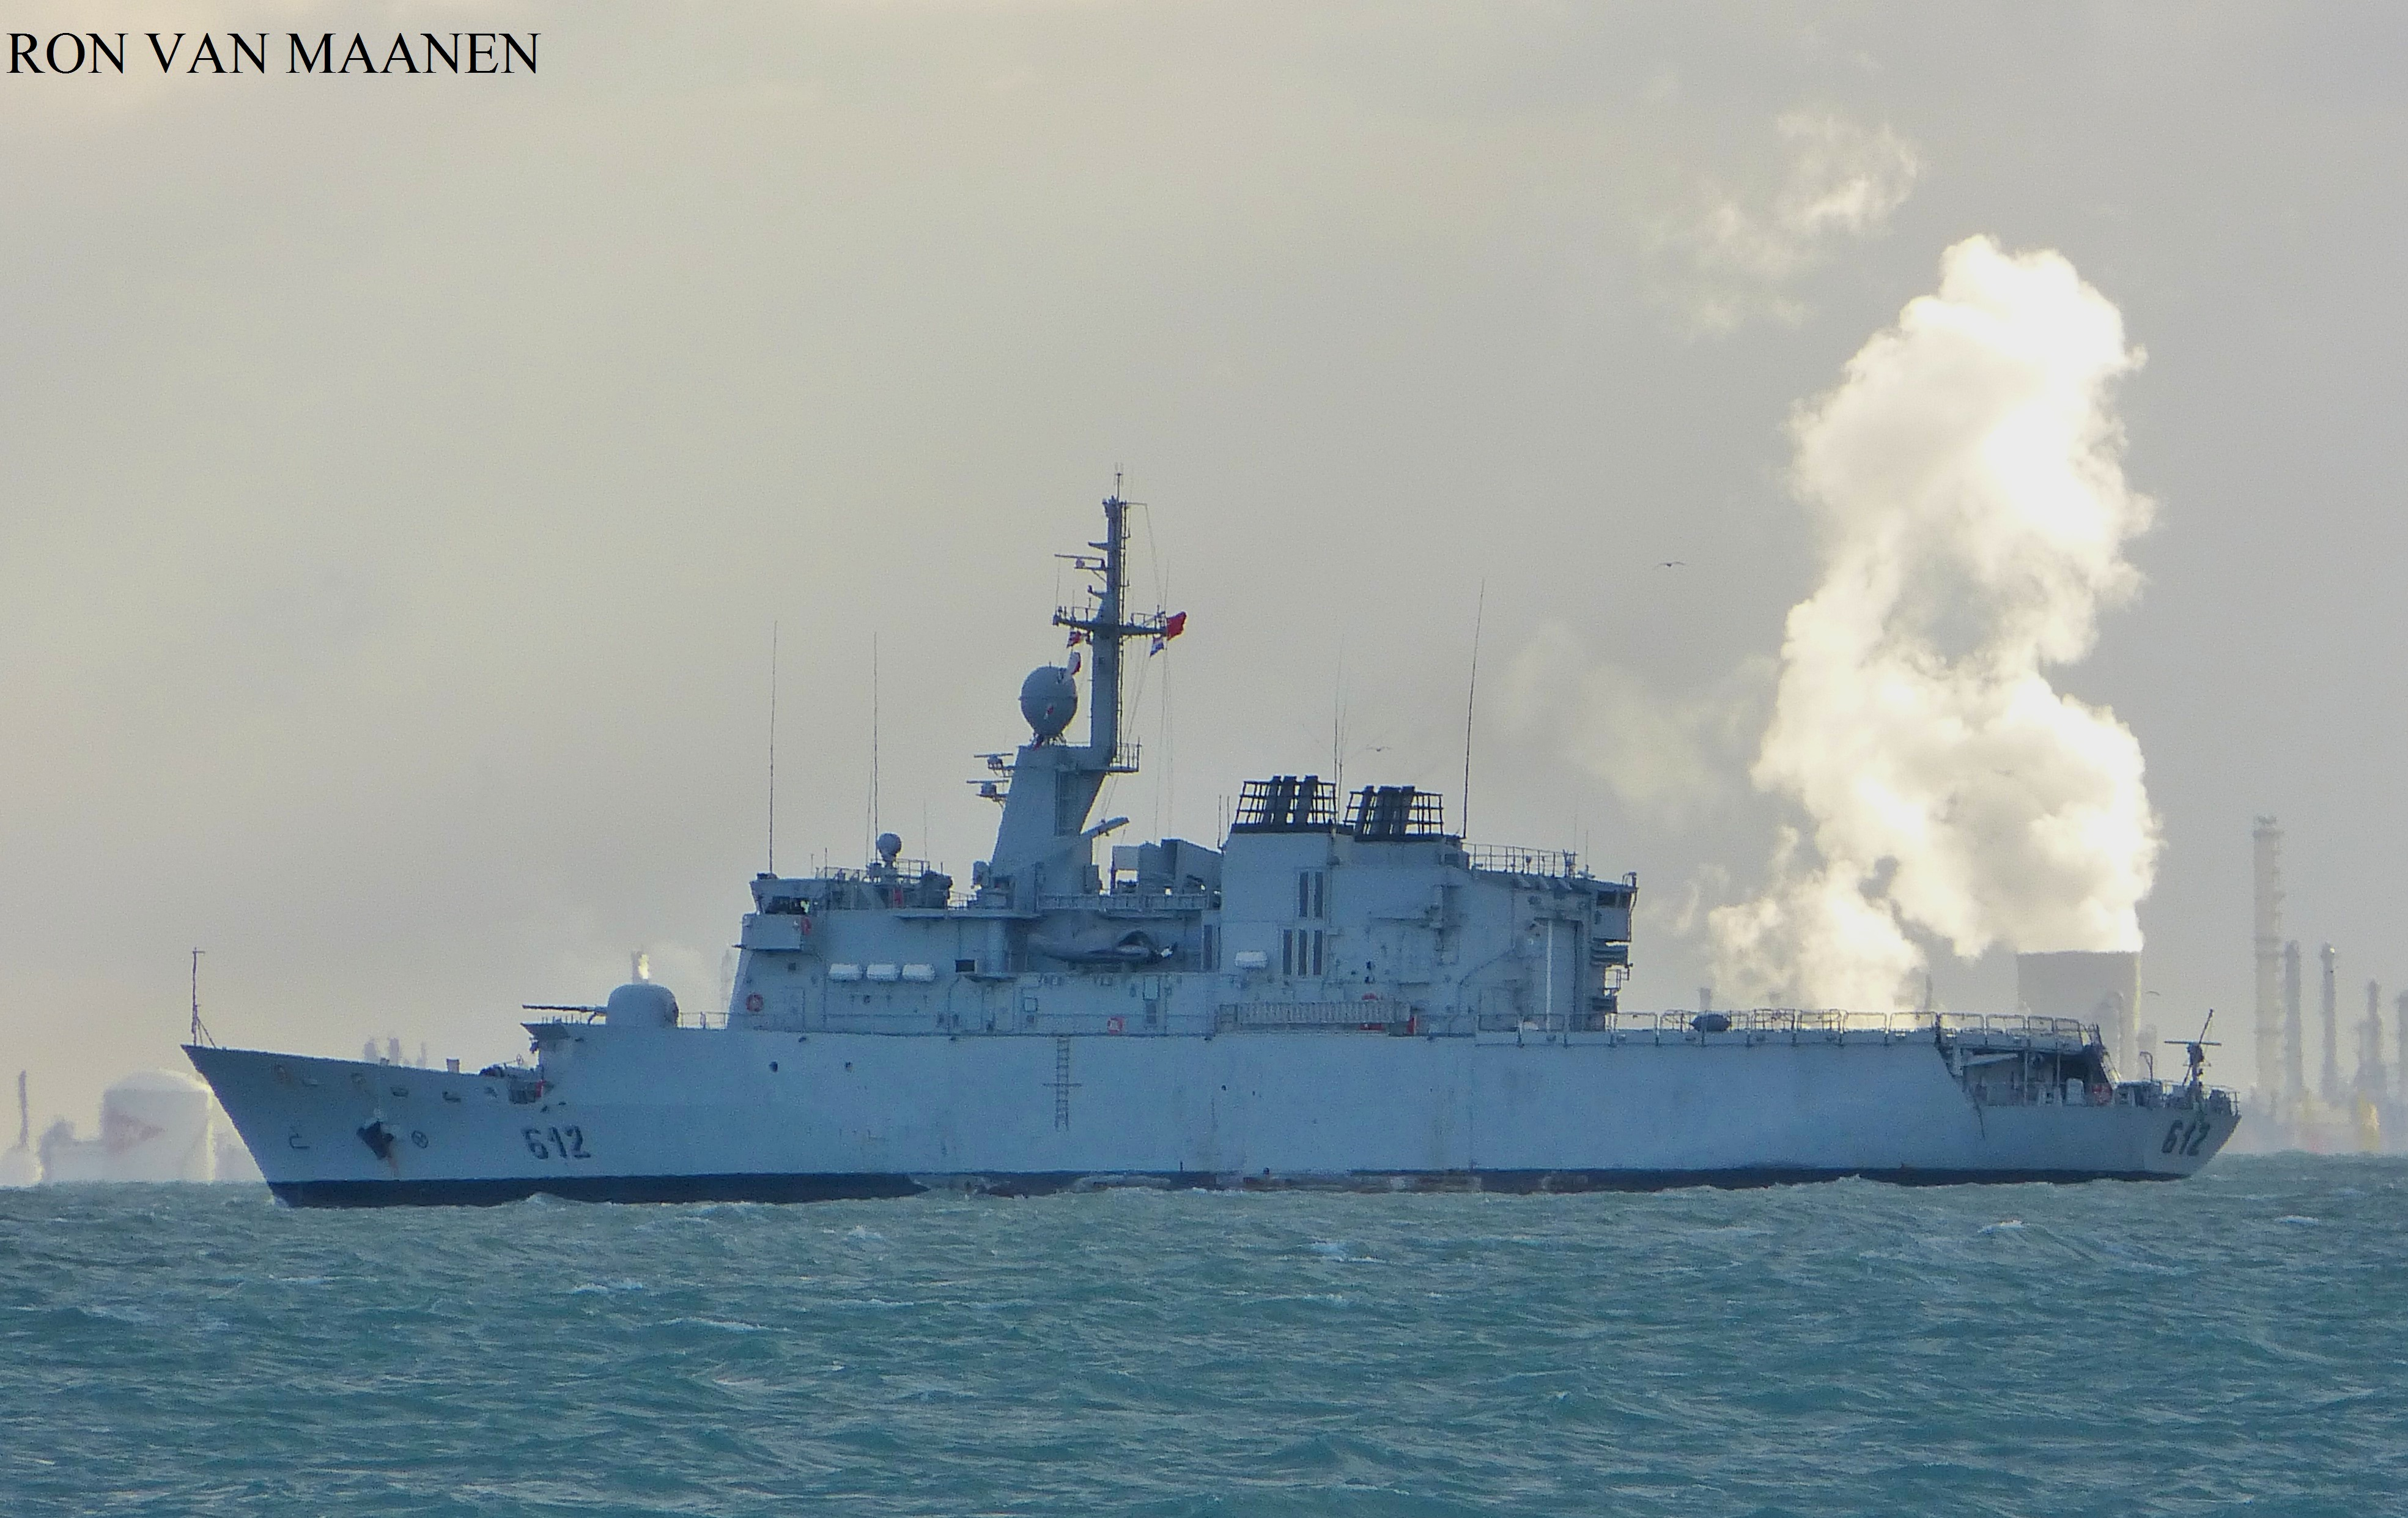 Royal Moroccan Navy Floréal Frigates / Frégates Floréal Marocaines - Page 12 Moroccan_light_surveillance_frigate_hassan_ii_2001_by_roodbaard1958-dbtid5v